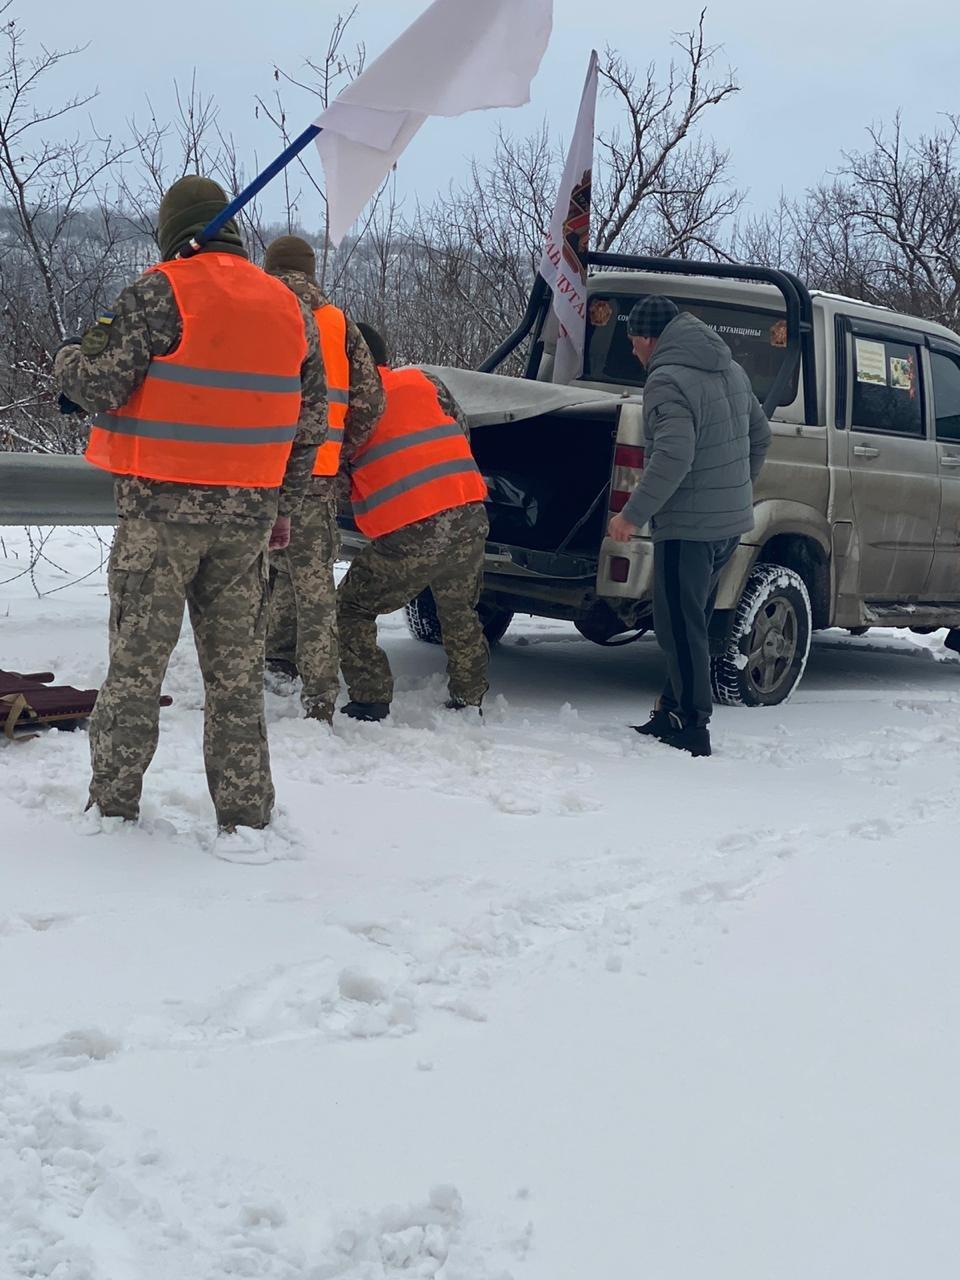 Бирюков: Боевики жестоко избили, а потом задушили взятого в плен воина ВСУ, - ФОТО, фото-2